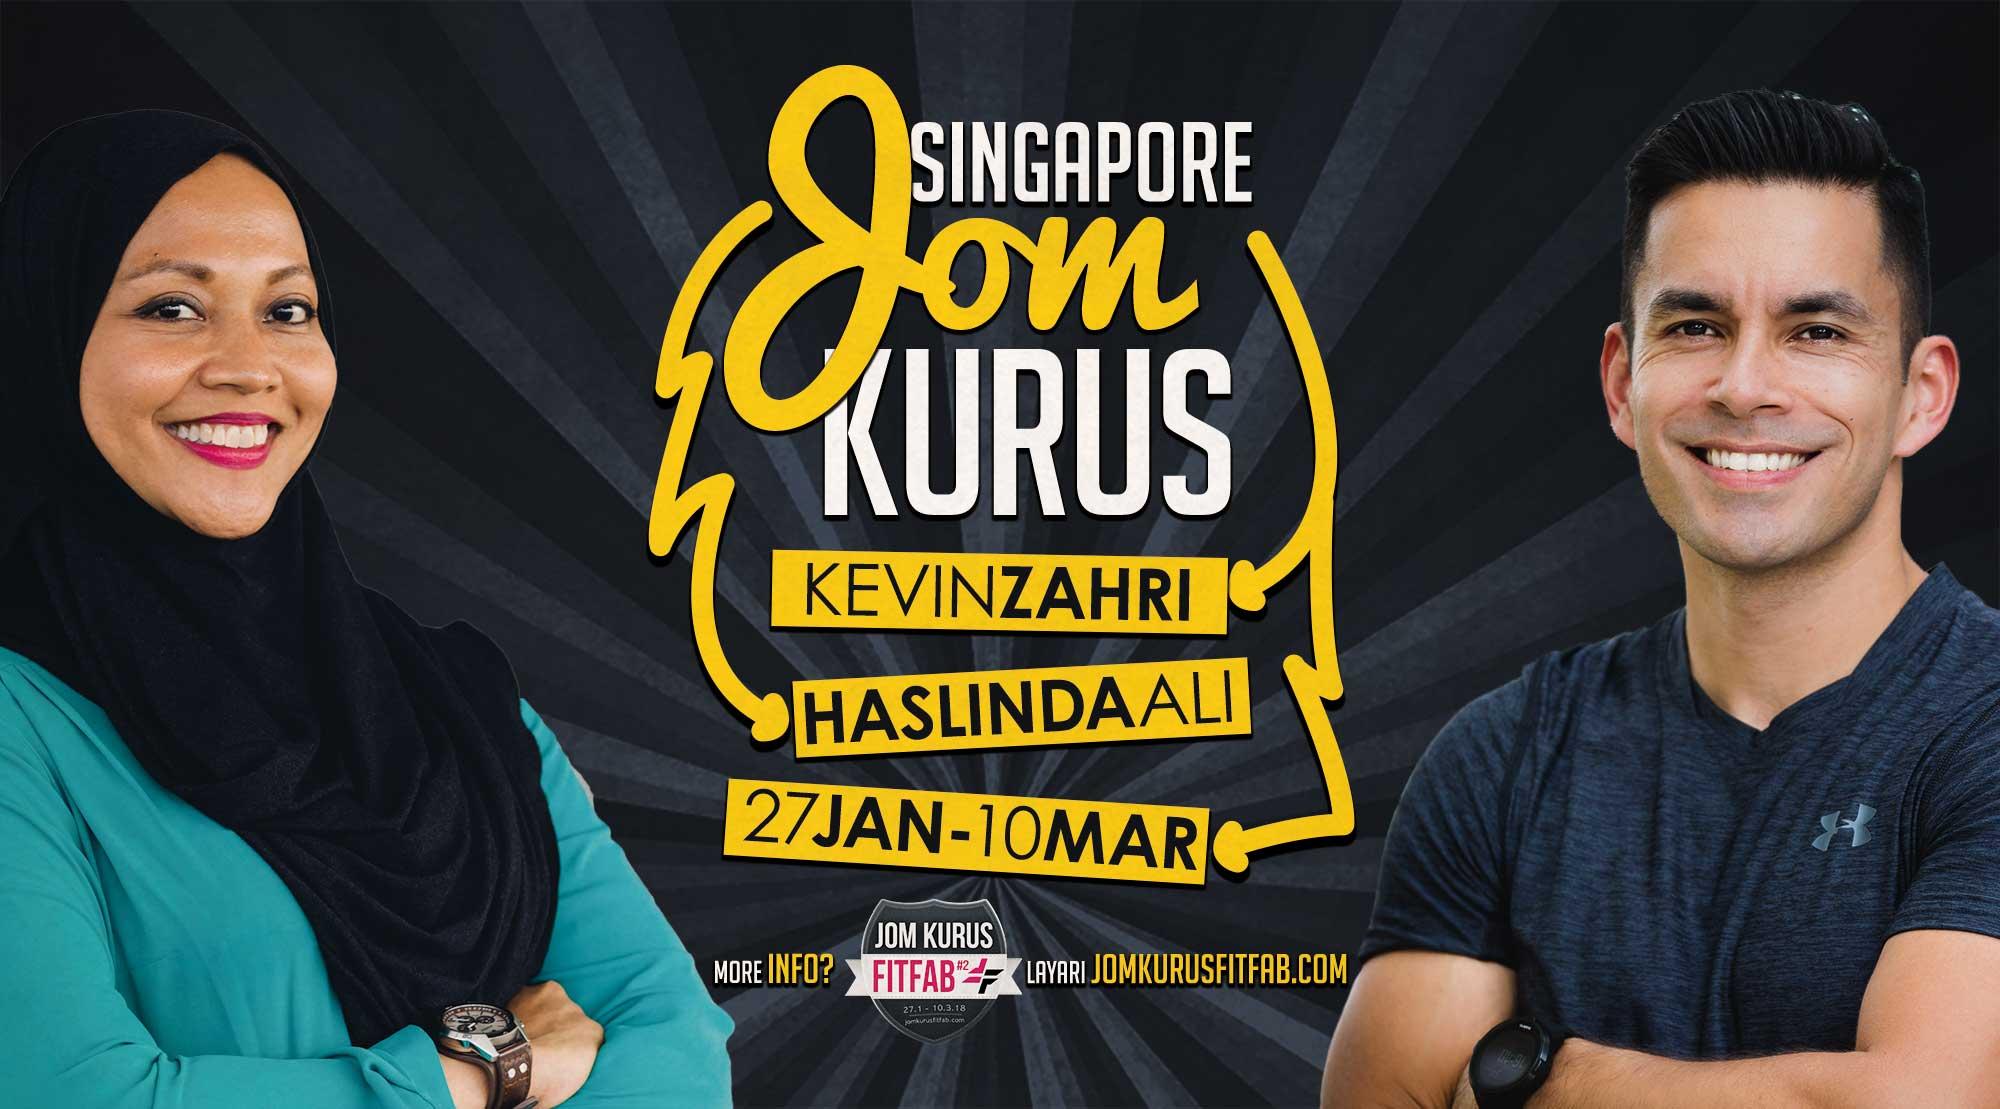 Jom Kurus Singapore FitFab Season 2 - KevinZahri.com